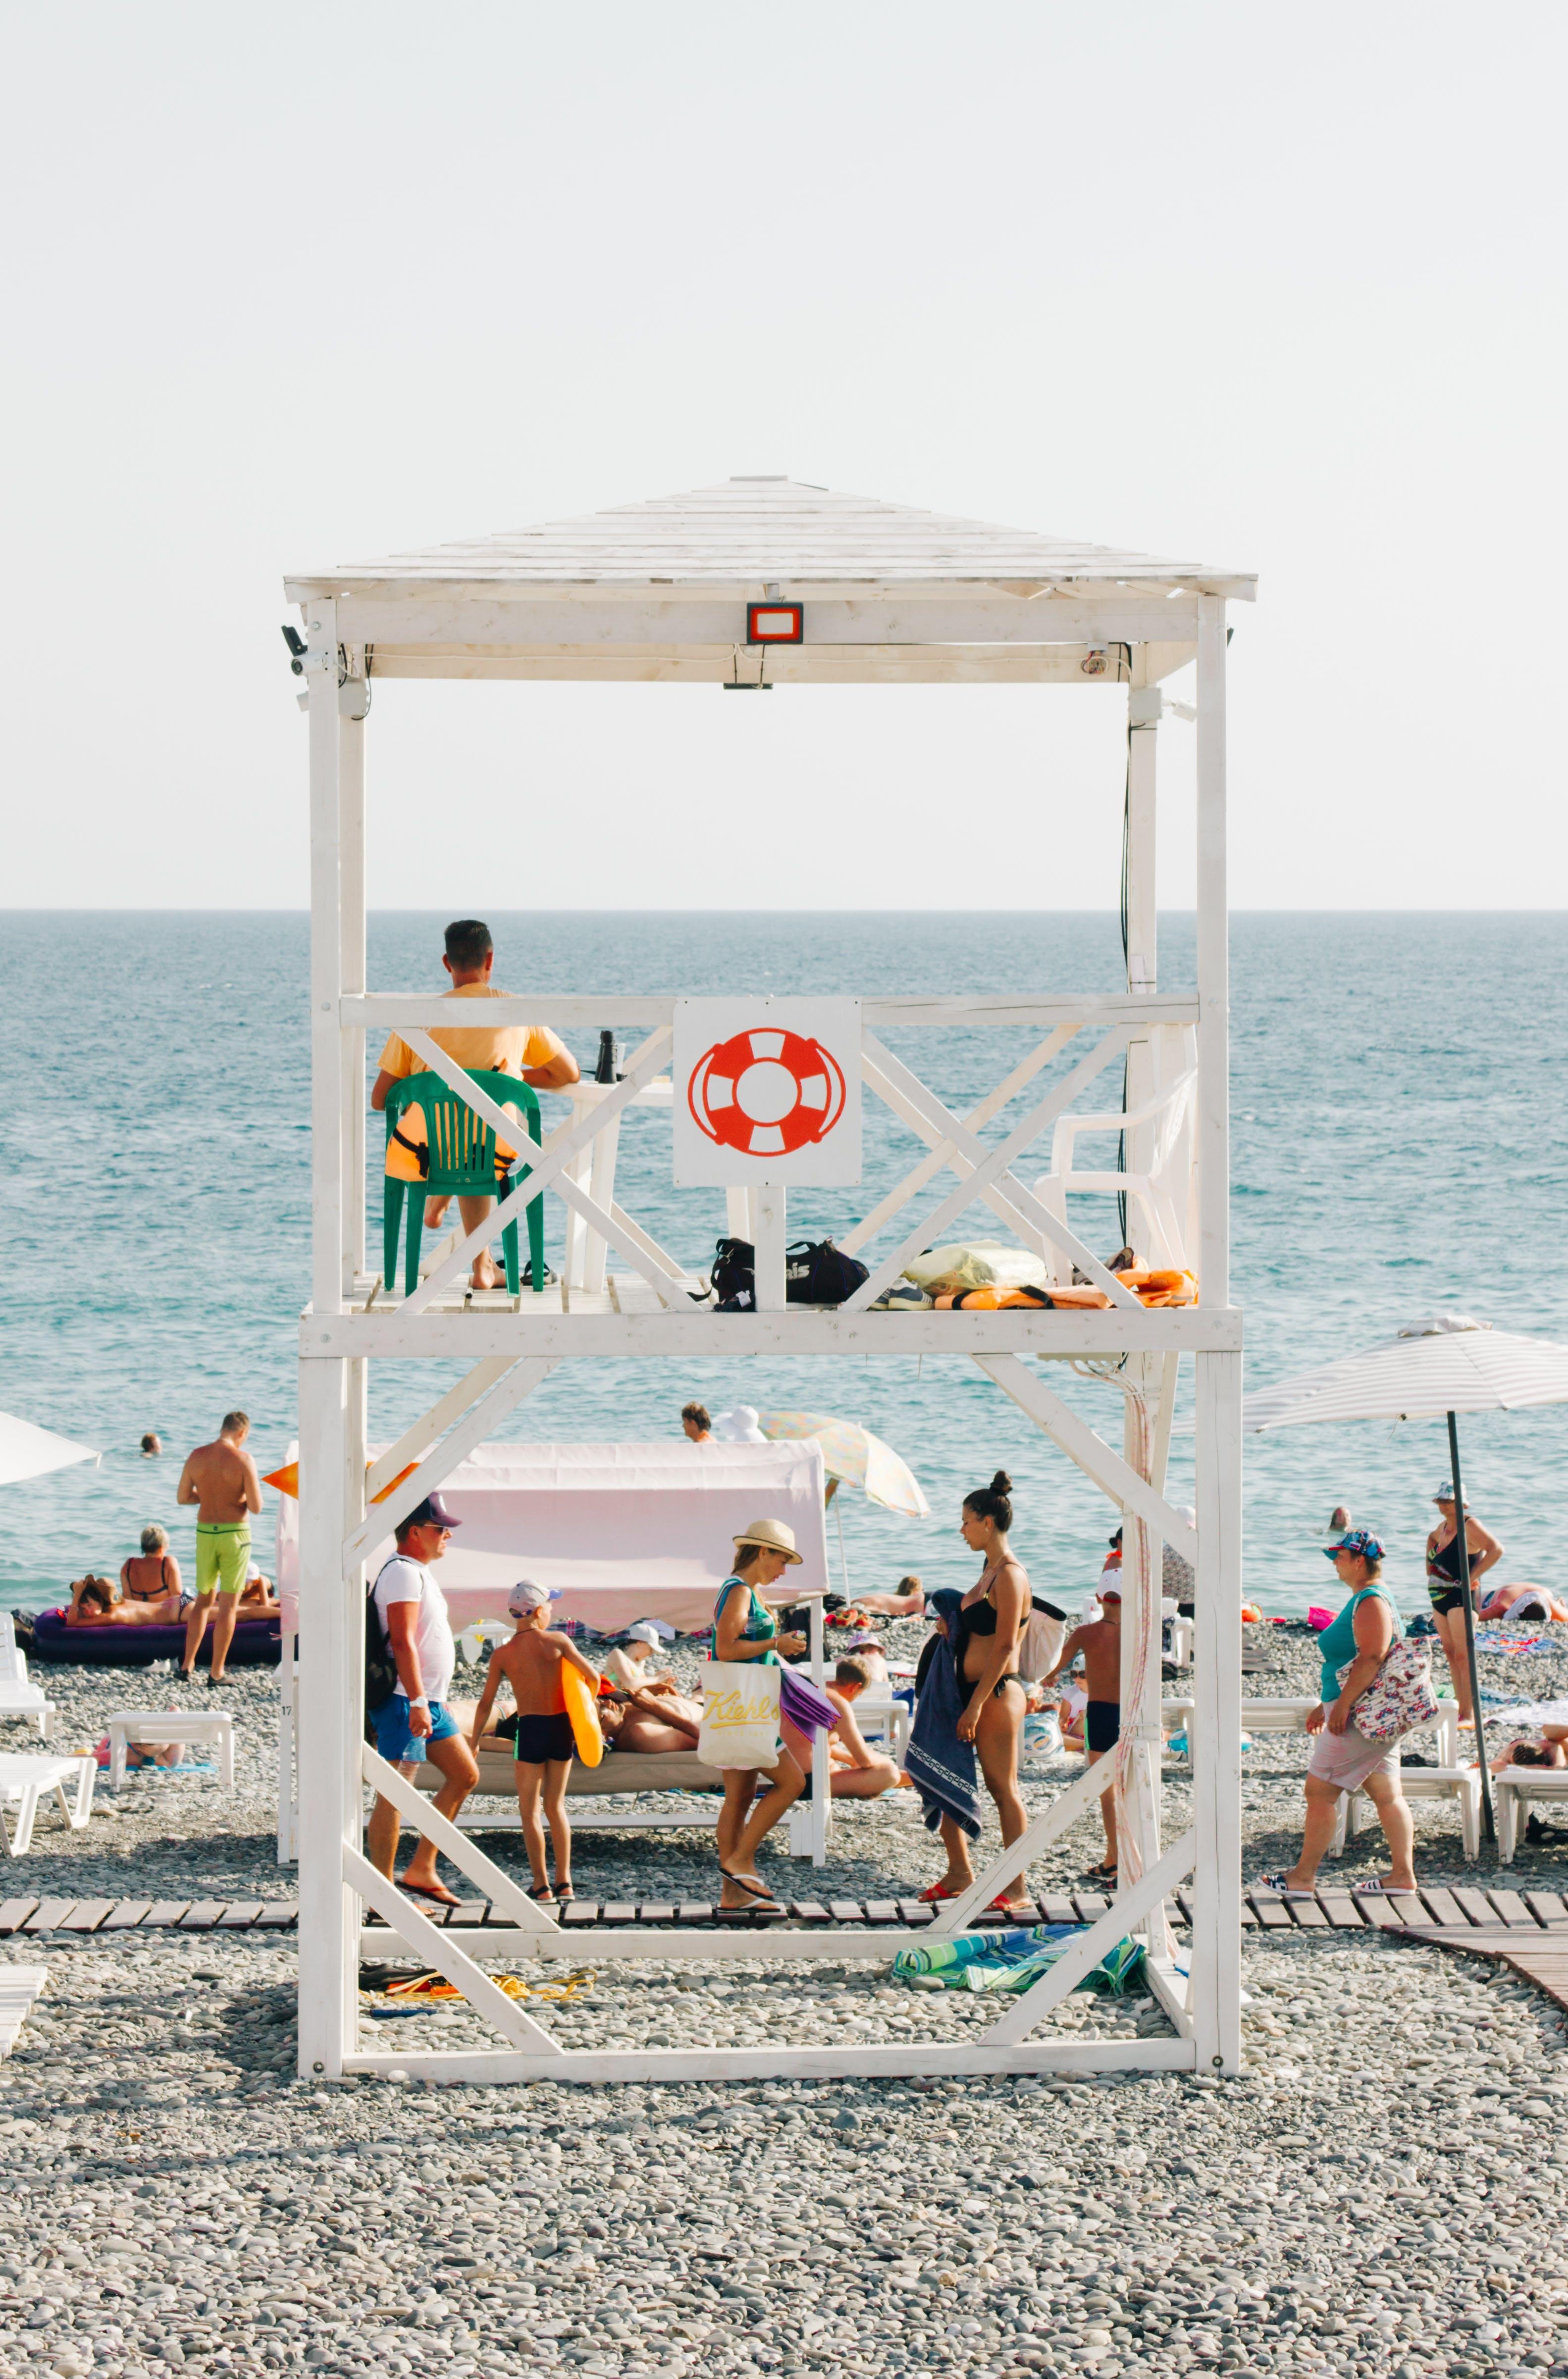 People Near Beach With Lifeguard Gazebo